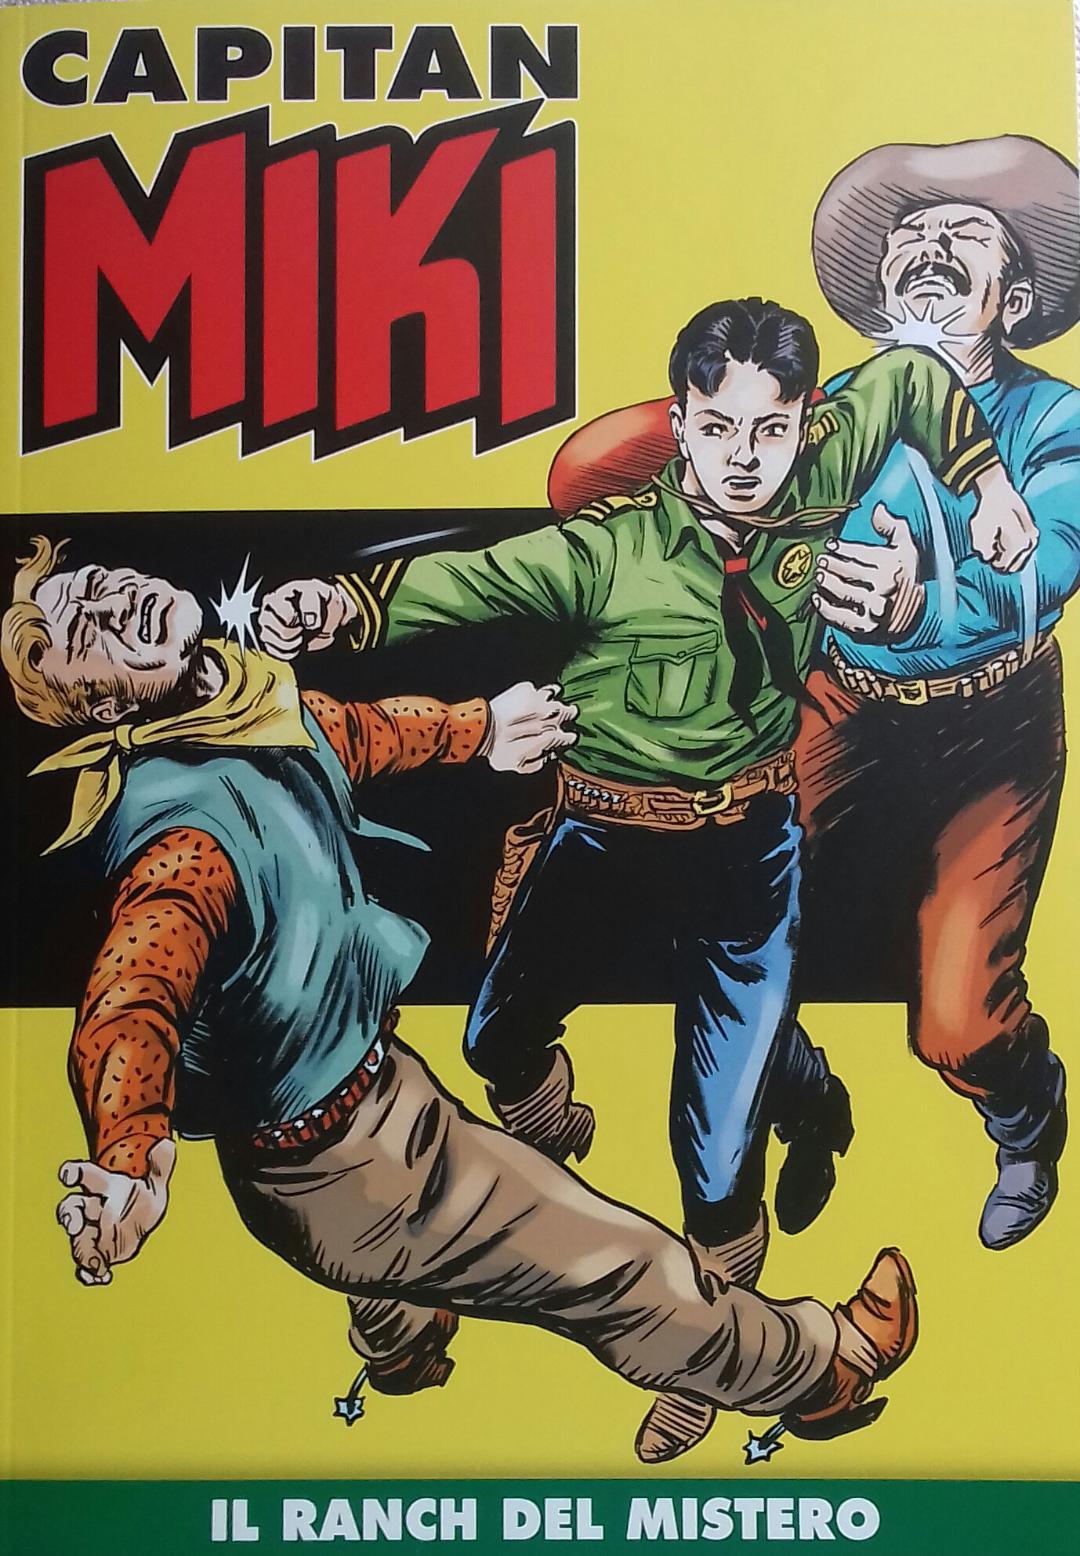 Capitan Miki n. 25